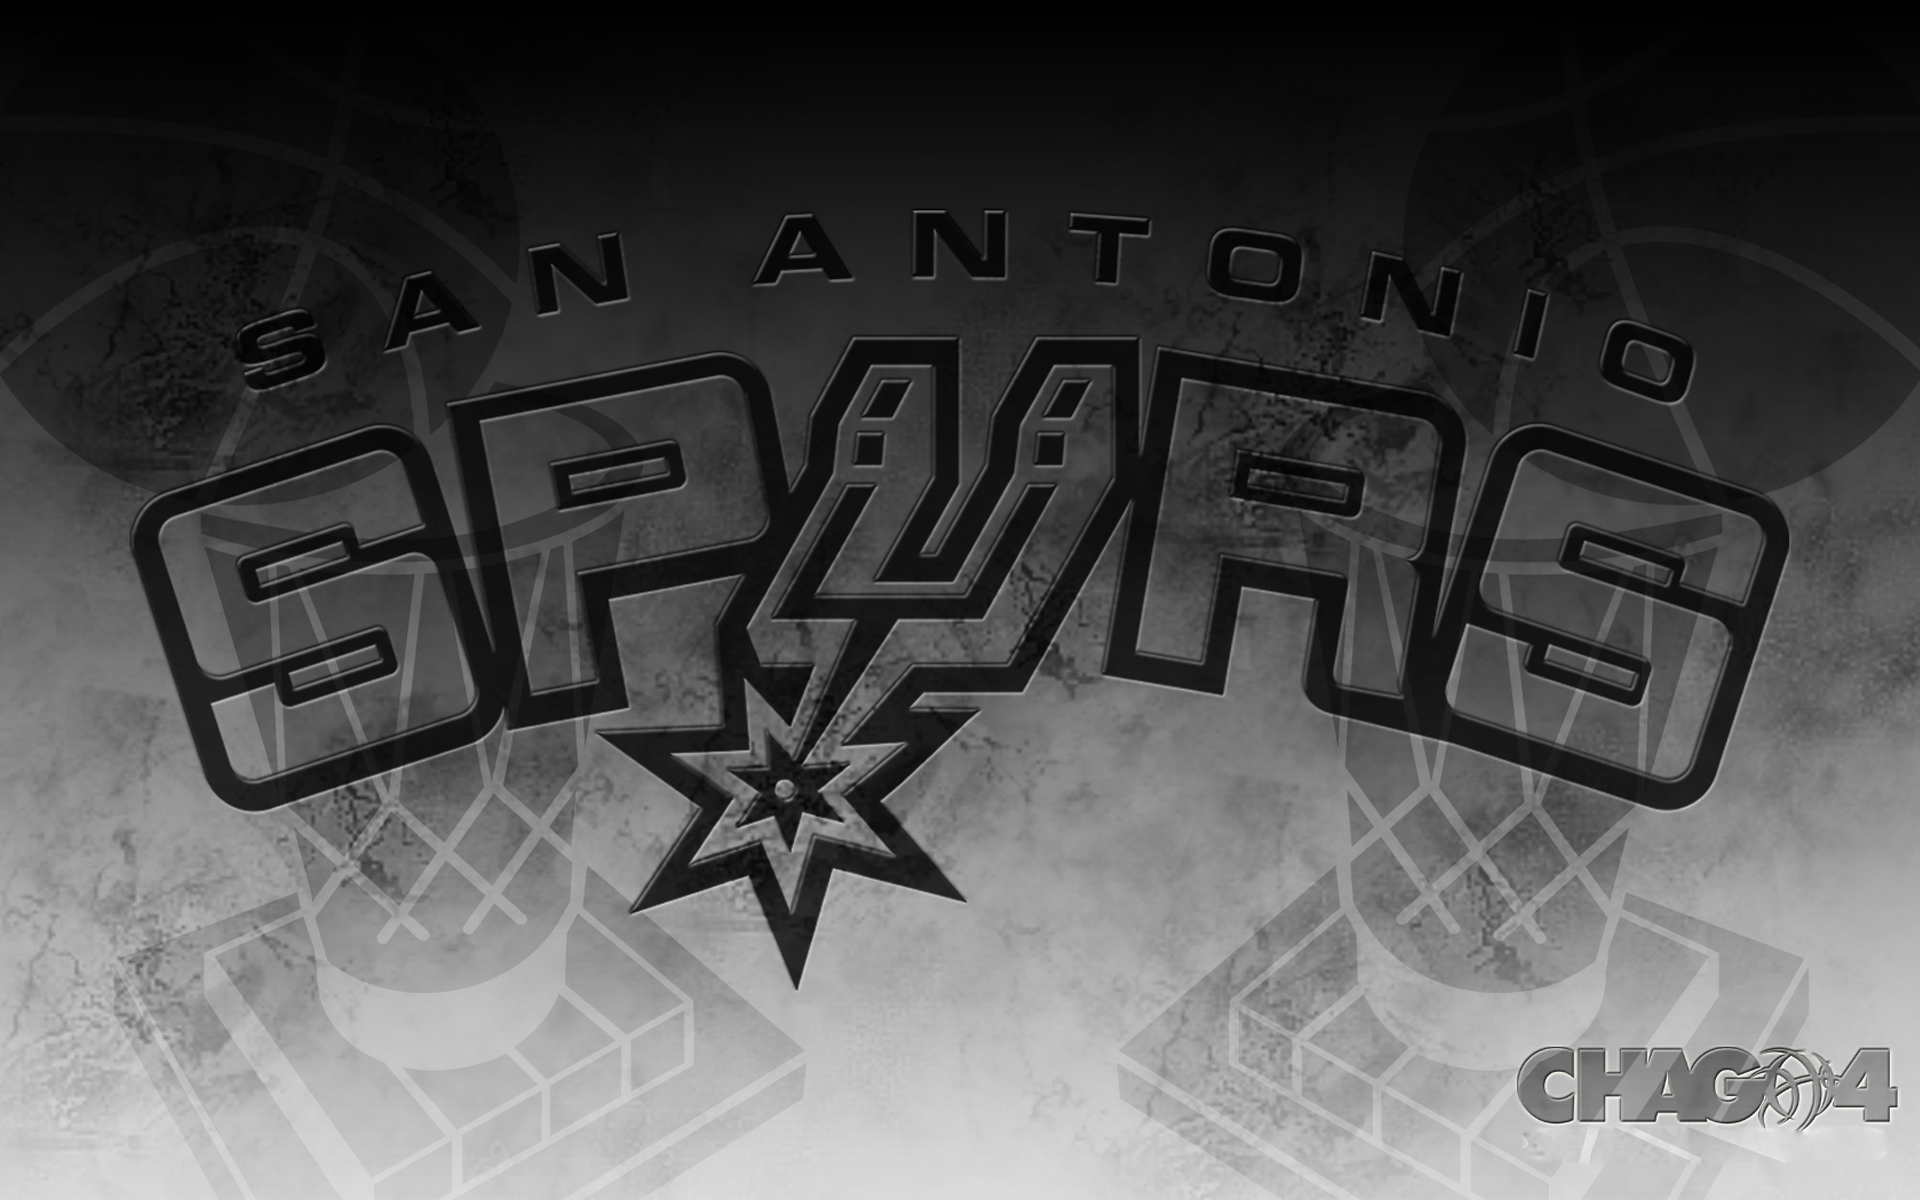 Kobe Bryant Quotes Wallpaper Hd Spurs Logo Wallpaper Pixelstalk Net